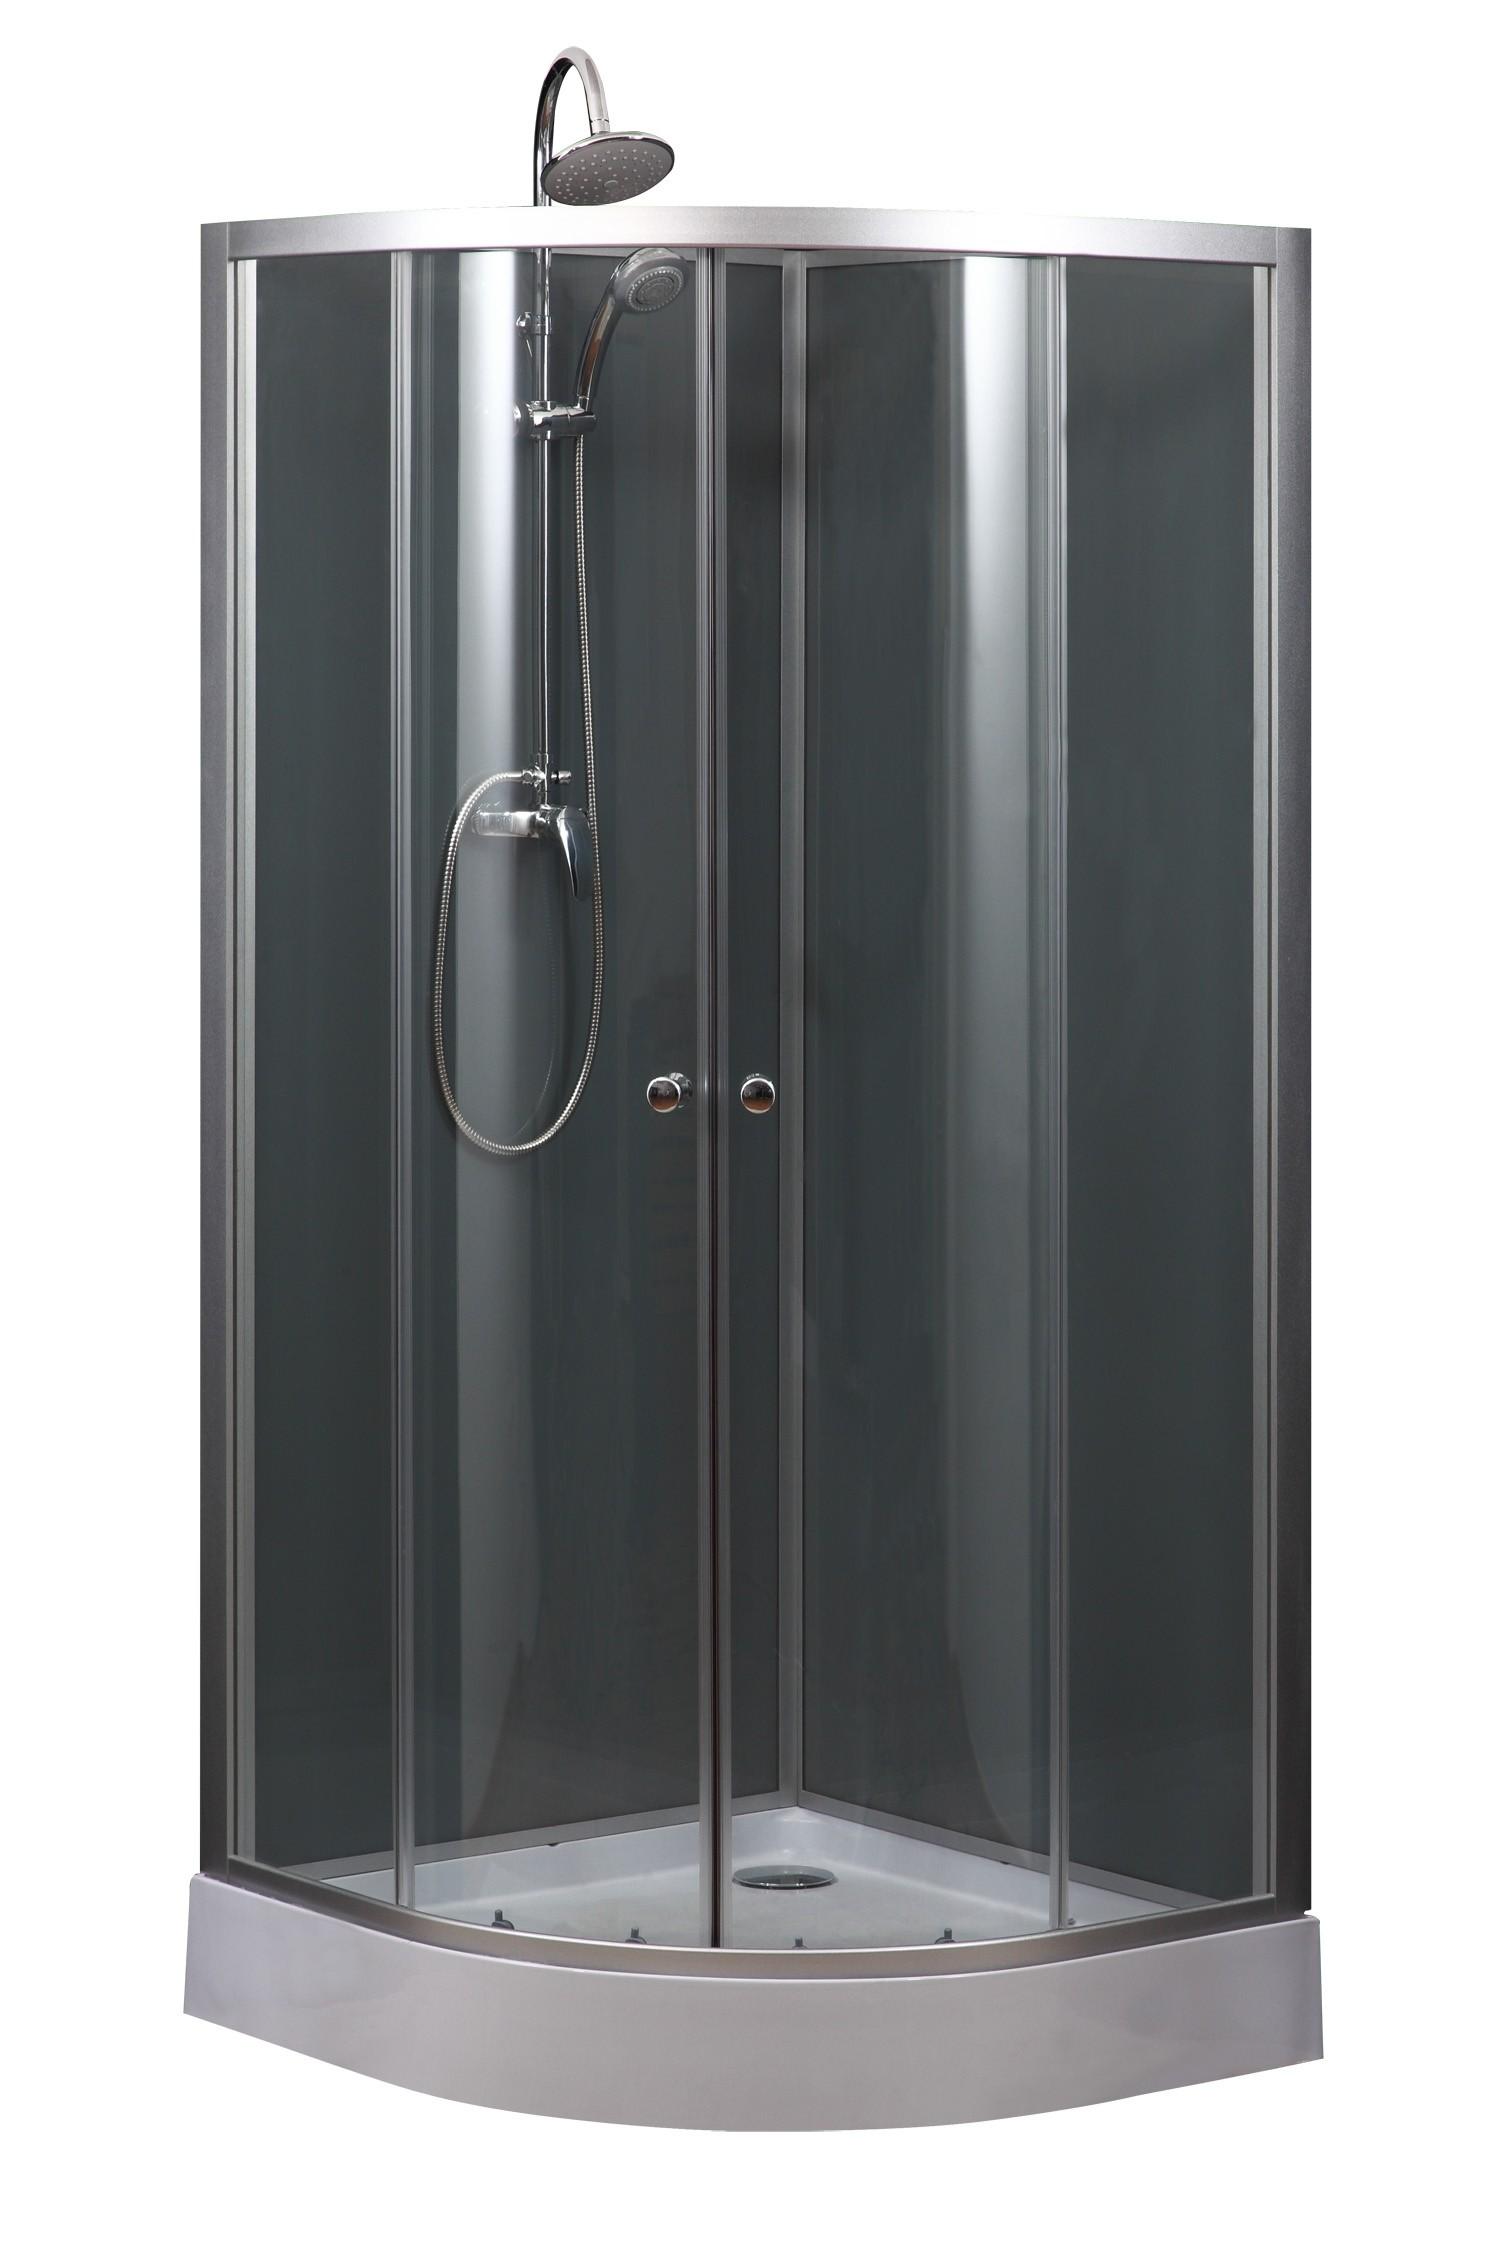 gracieux cabine de douche integrale renaa conception. Black Bedroom Furniture Sets. Home Design Ideas